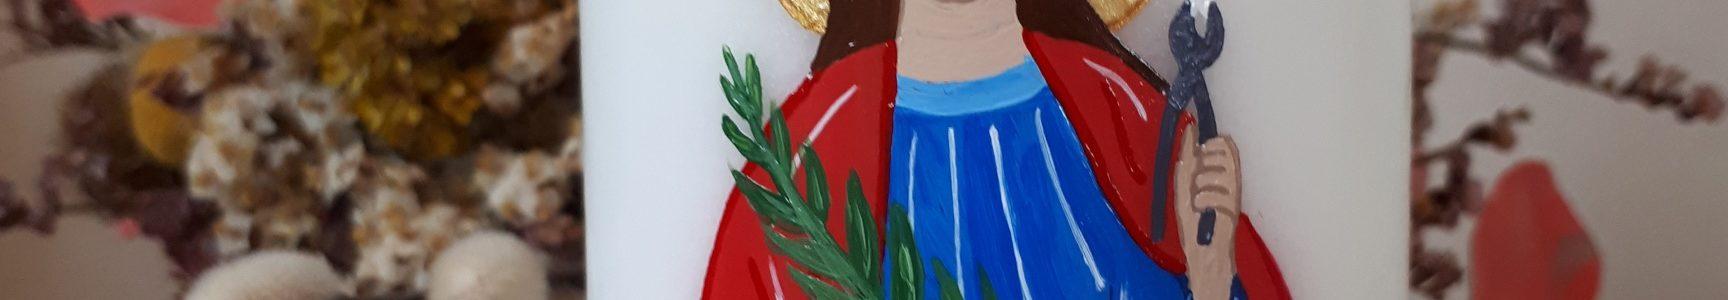 Sainte Apolline (avec ses attributs)